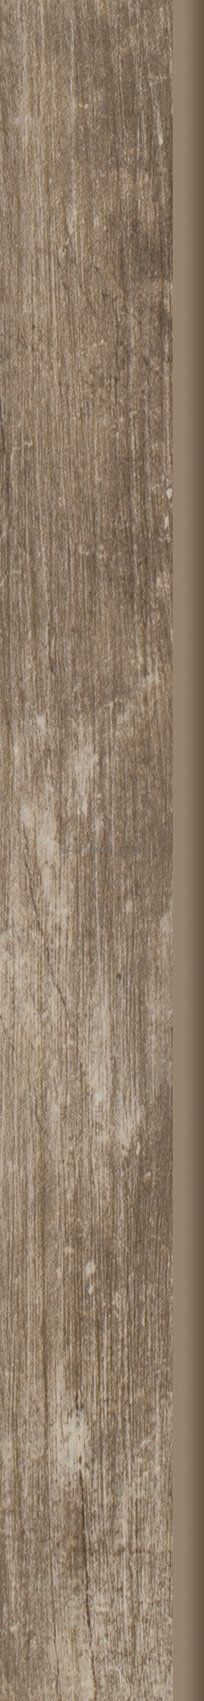 TROPHY BROWN COKÓŁ MAT. 7,2X60cm - cokół gresowy